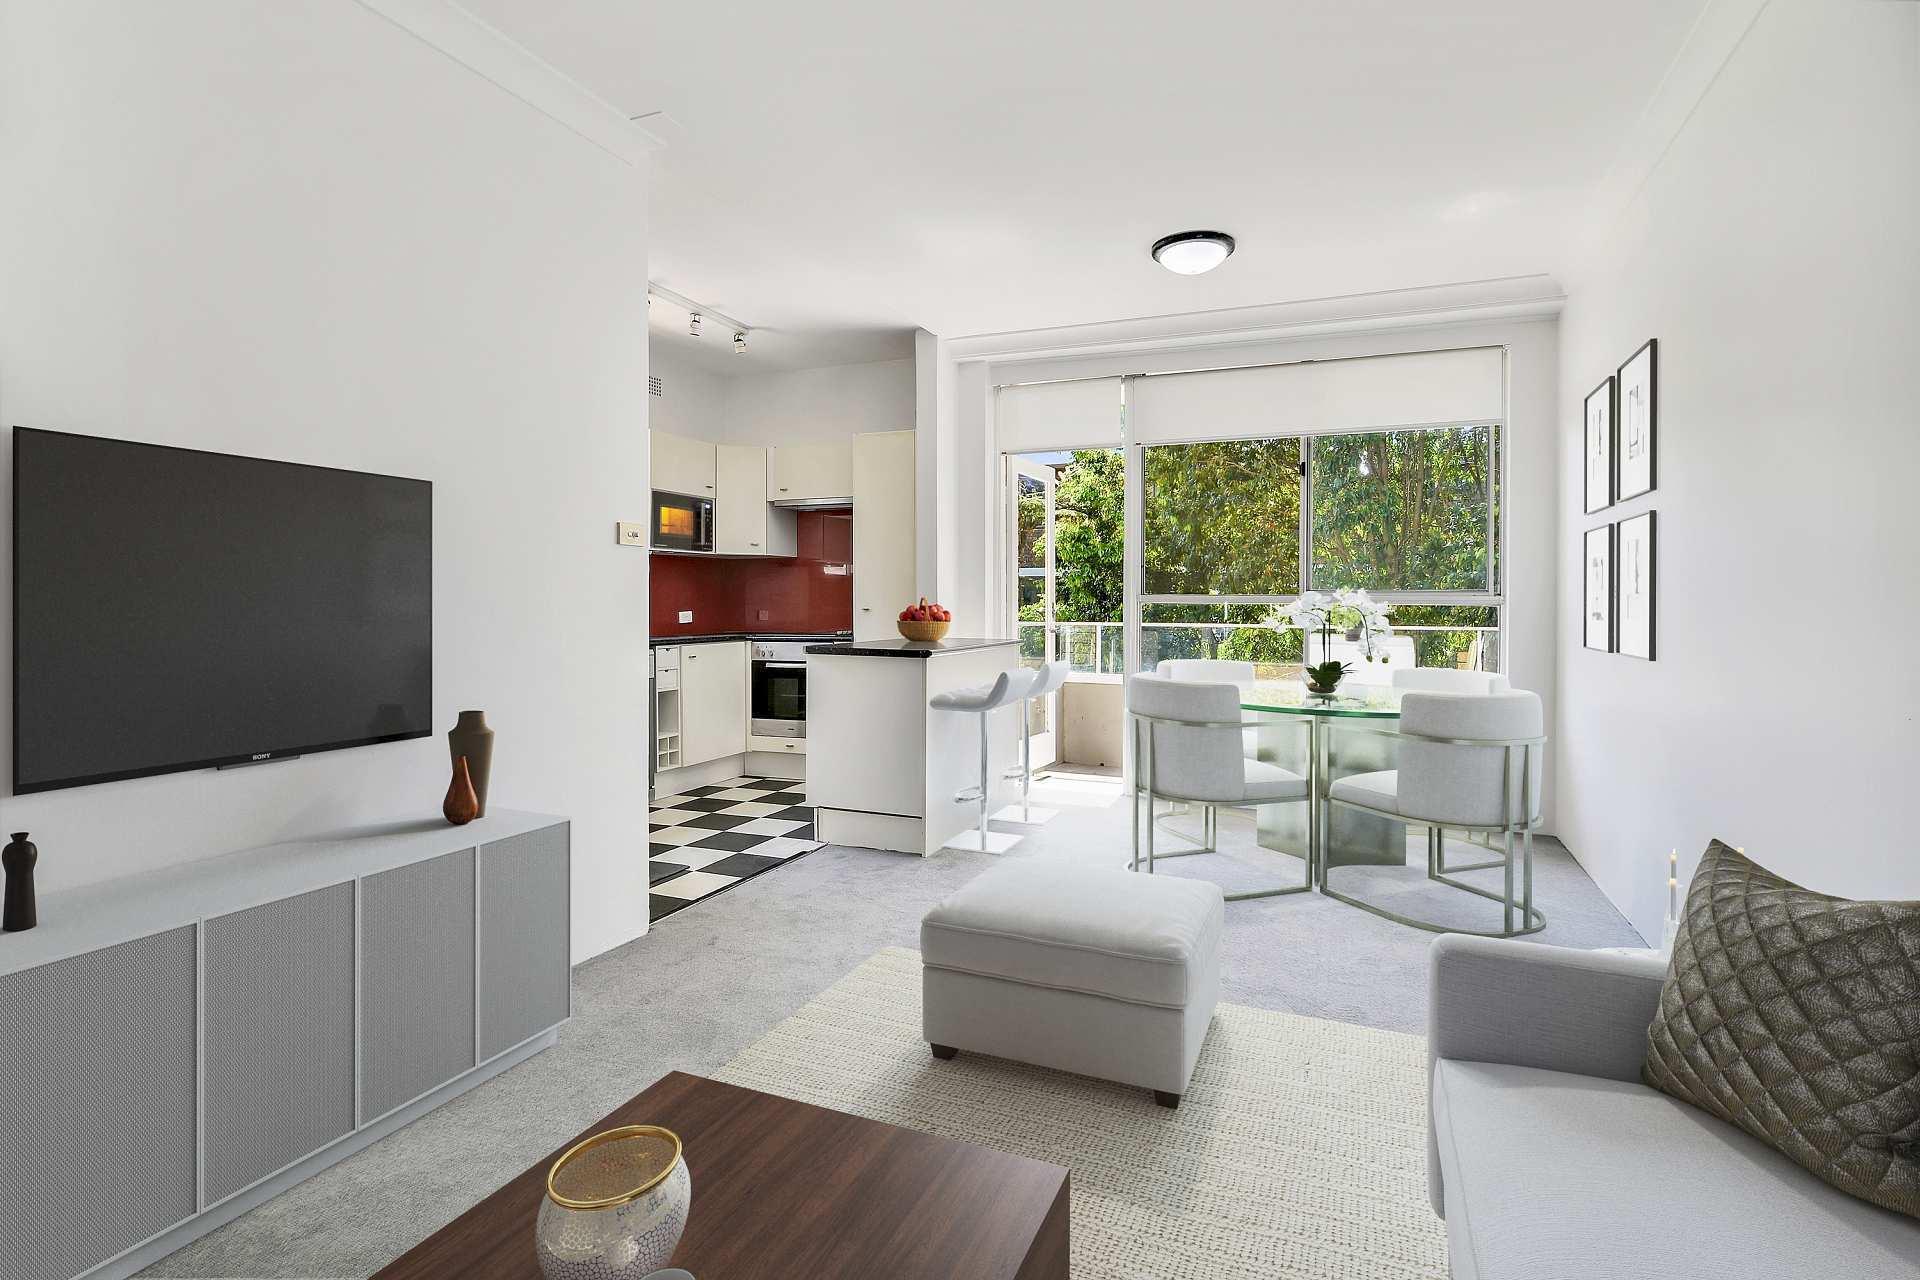 7/18 Kyngdon Street, Cammeray NSW 2062